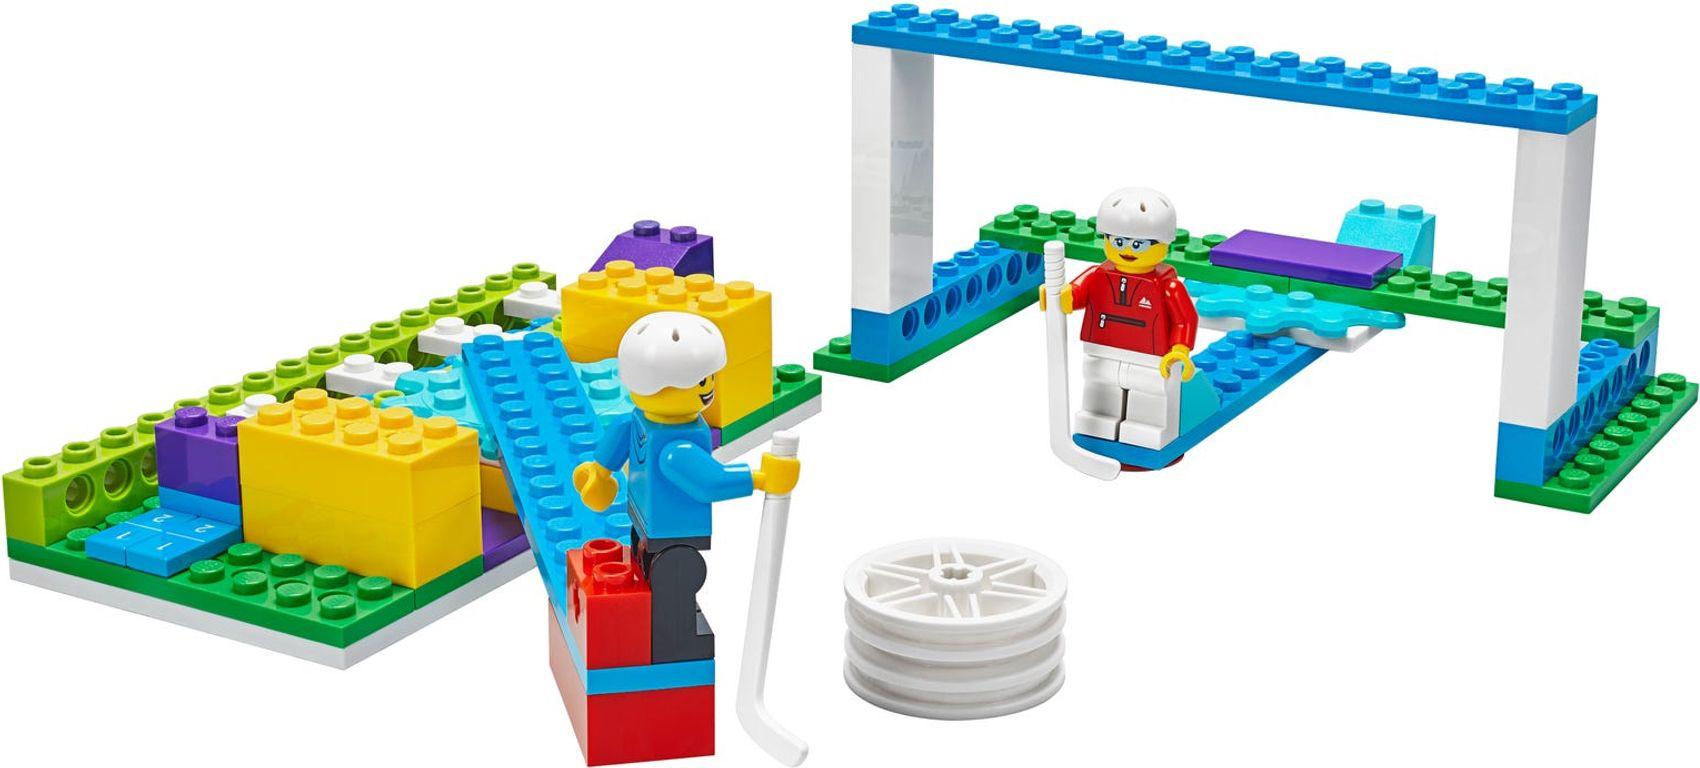 BricQ Motion Essential Set components